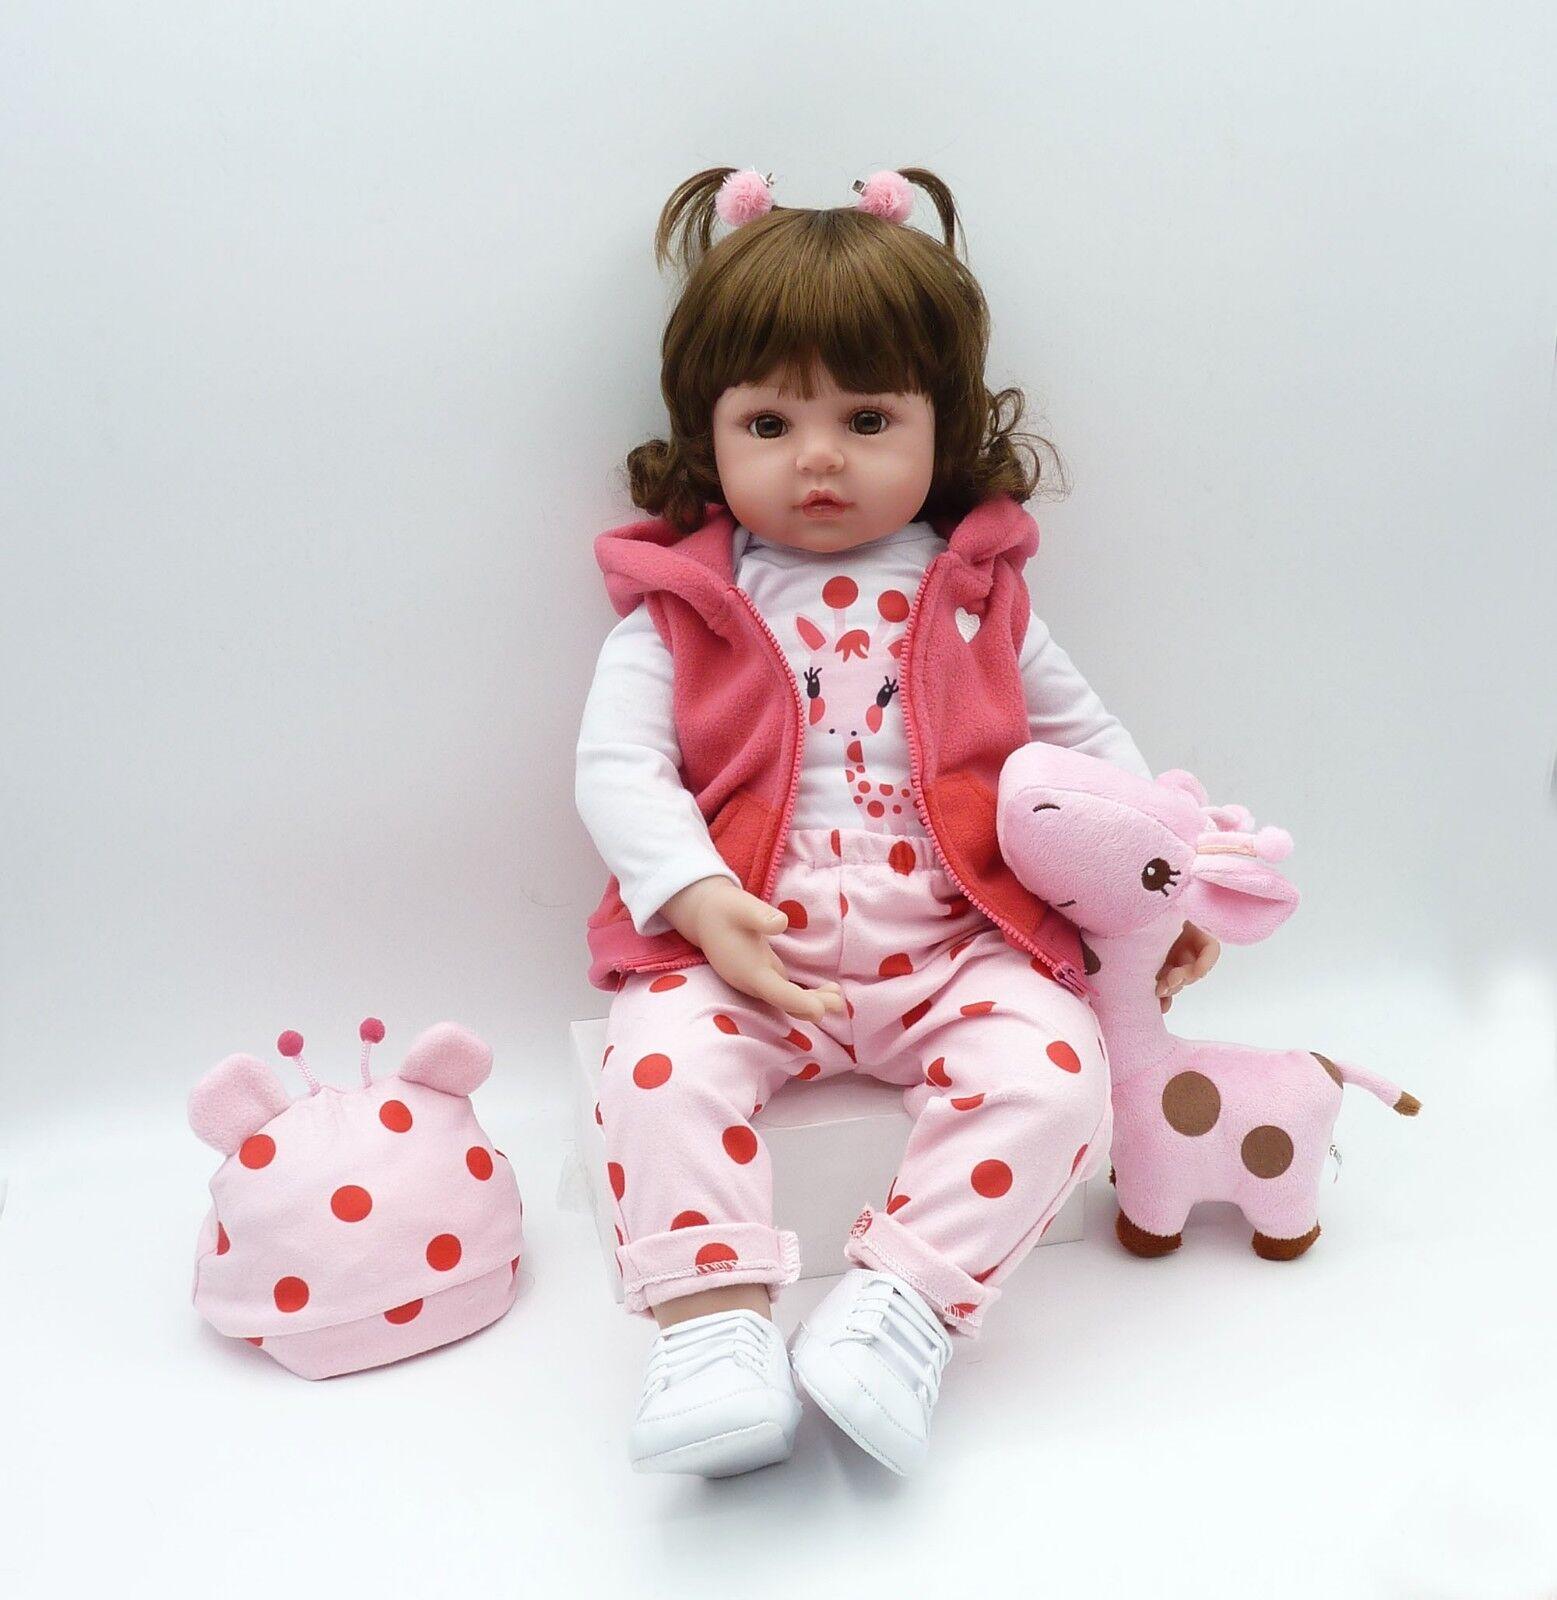 Купить Reborn Toddler Doll 18''45cm Realistic Handmade Lifelike Girl Presents Xmas Gift